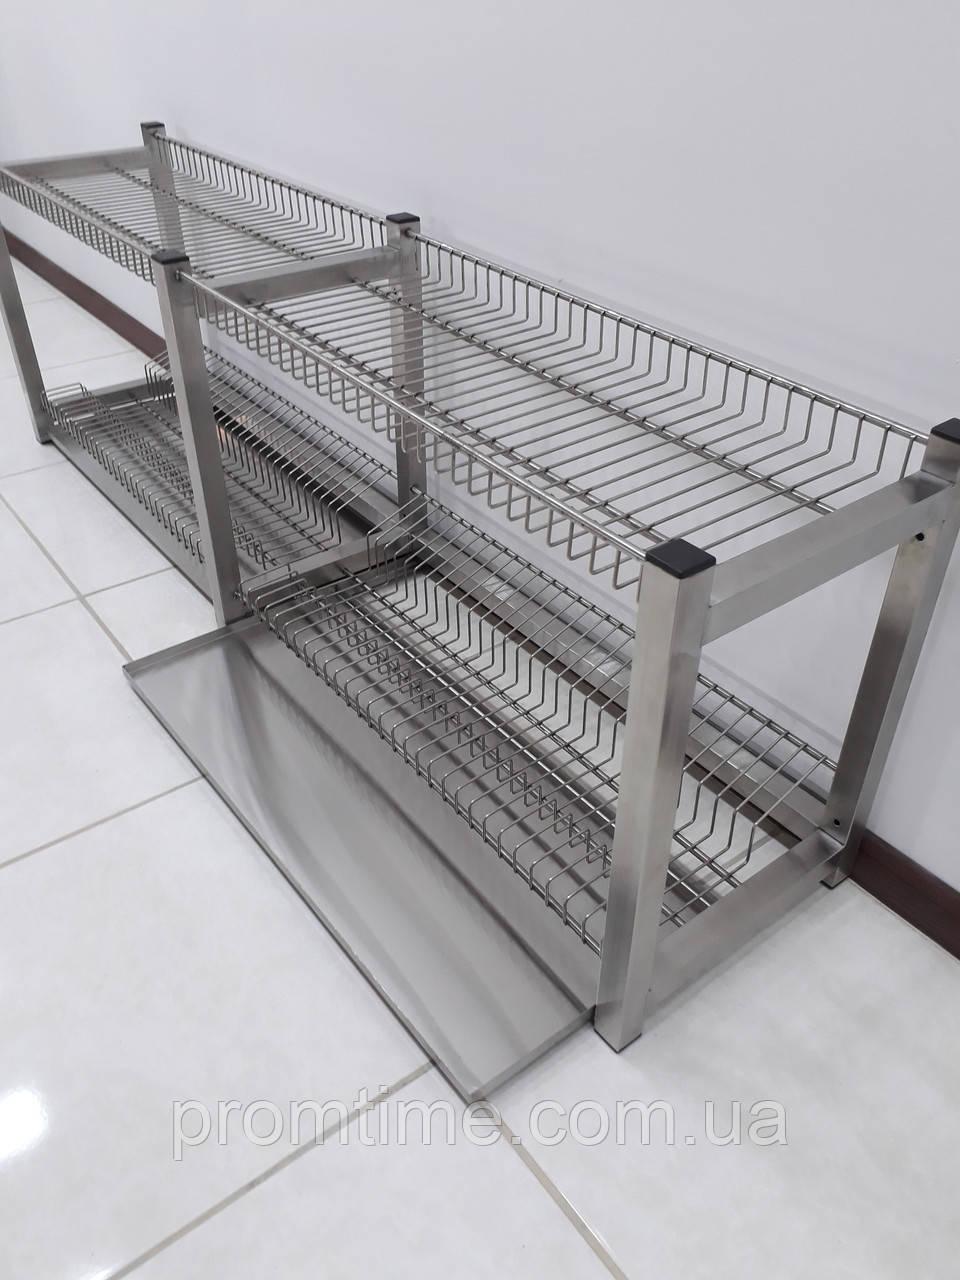 Навесная полка для сушки посуды 1500х320х500